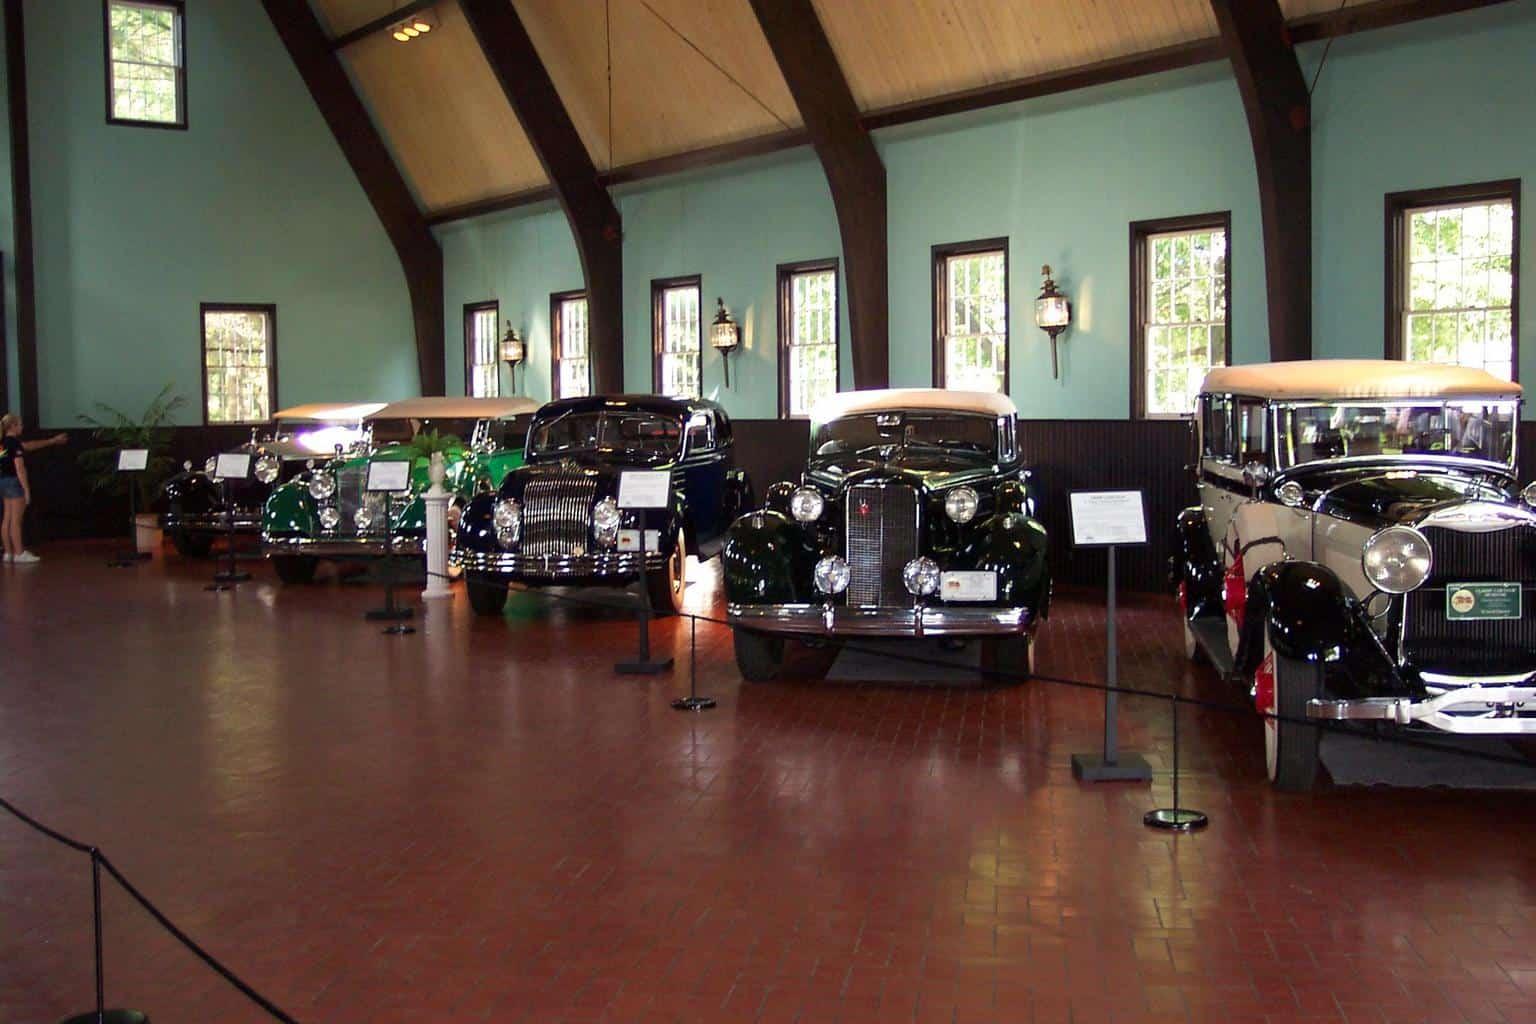 Visit the Gilmore Car Museum this spring break Michigan